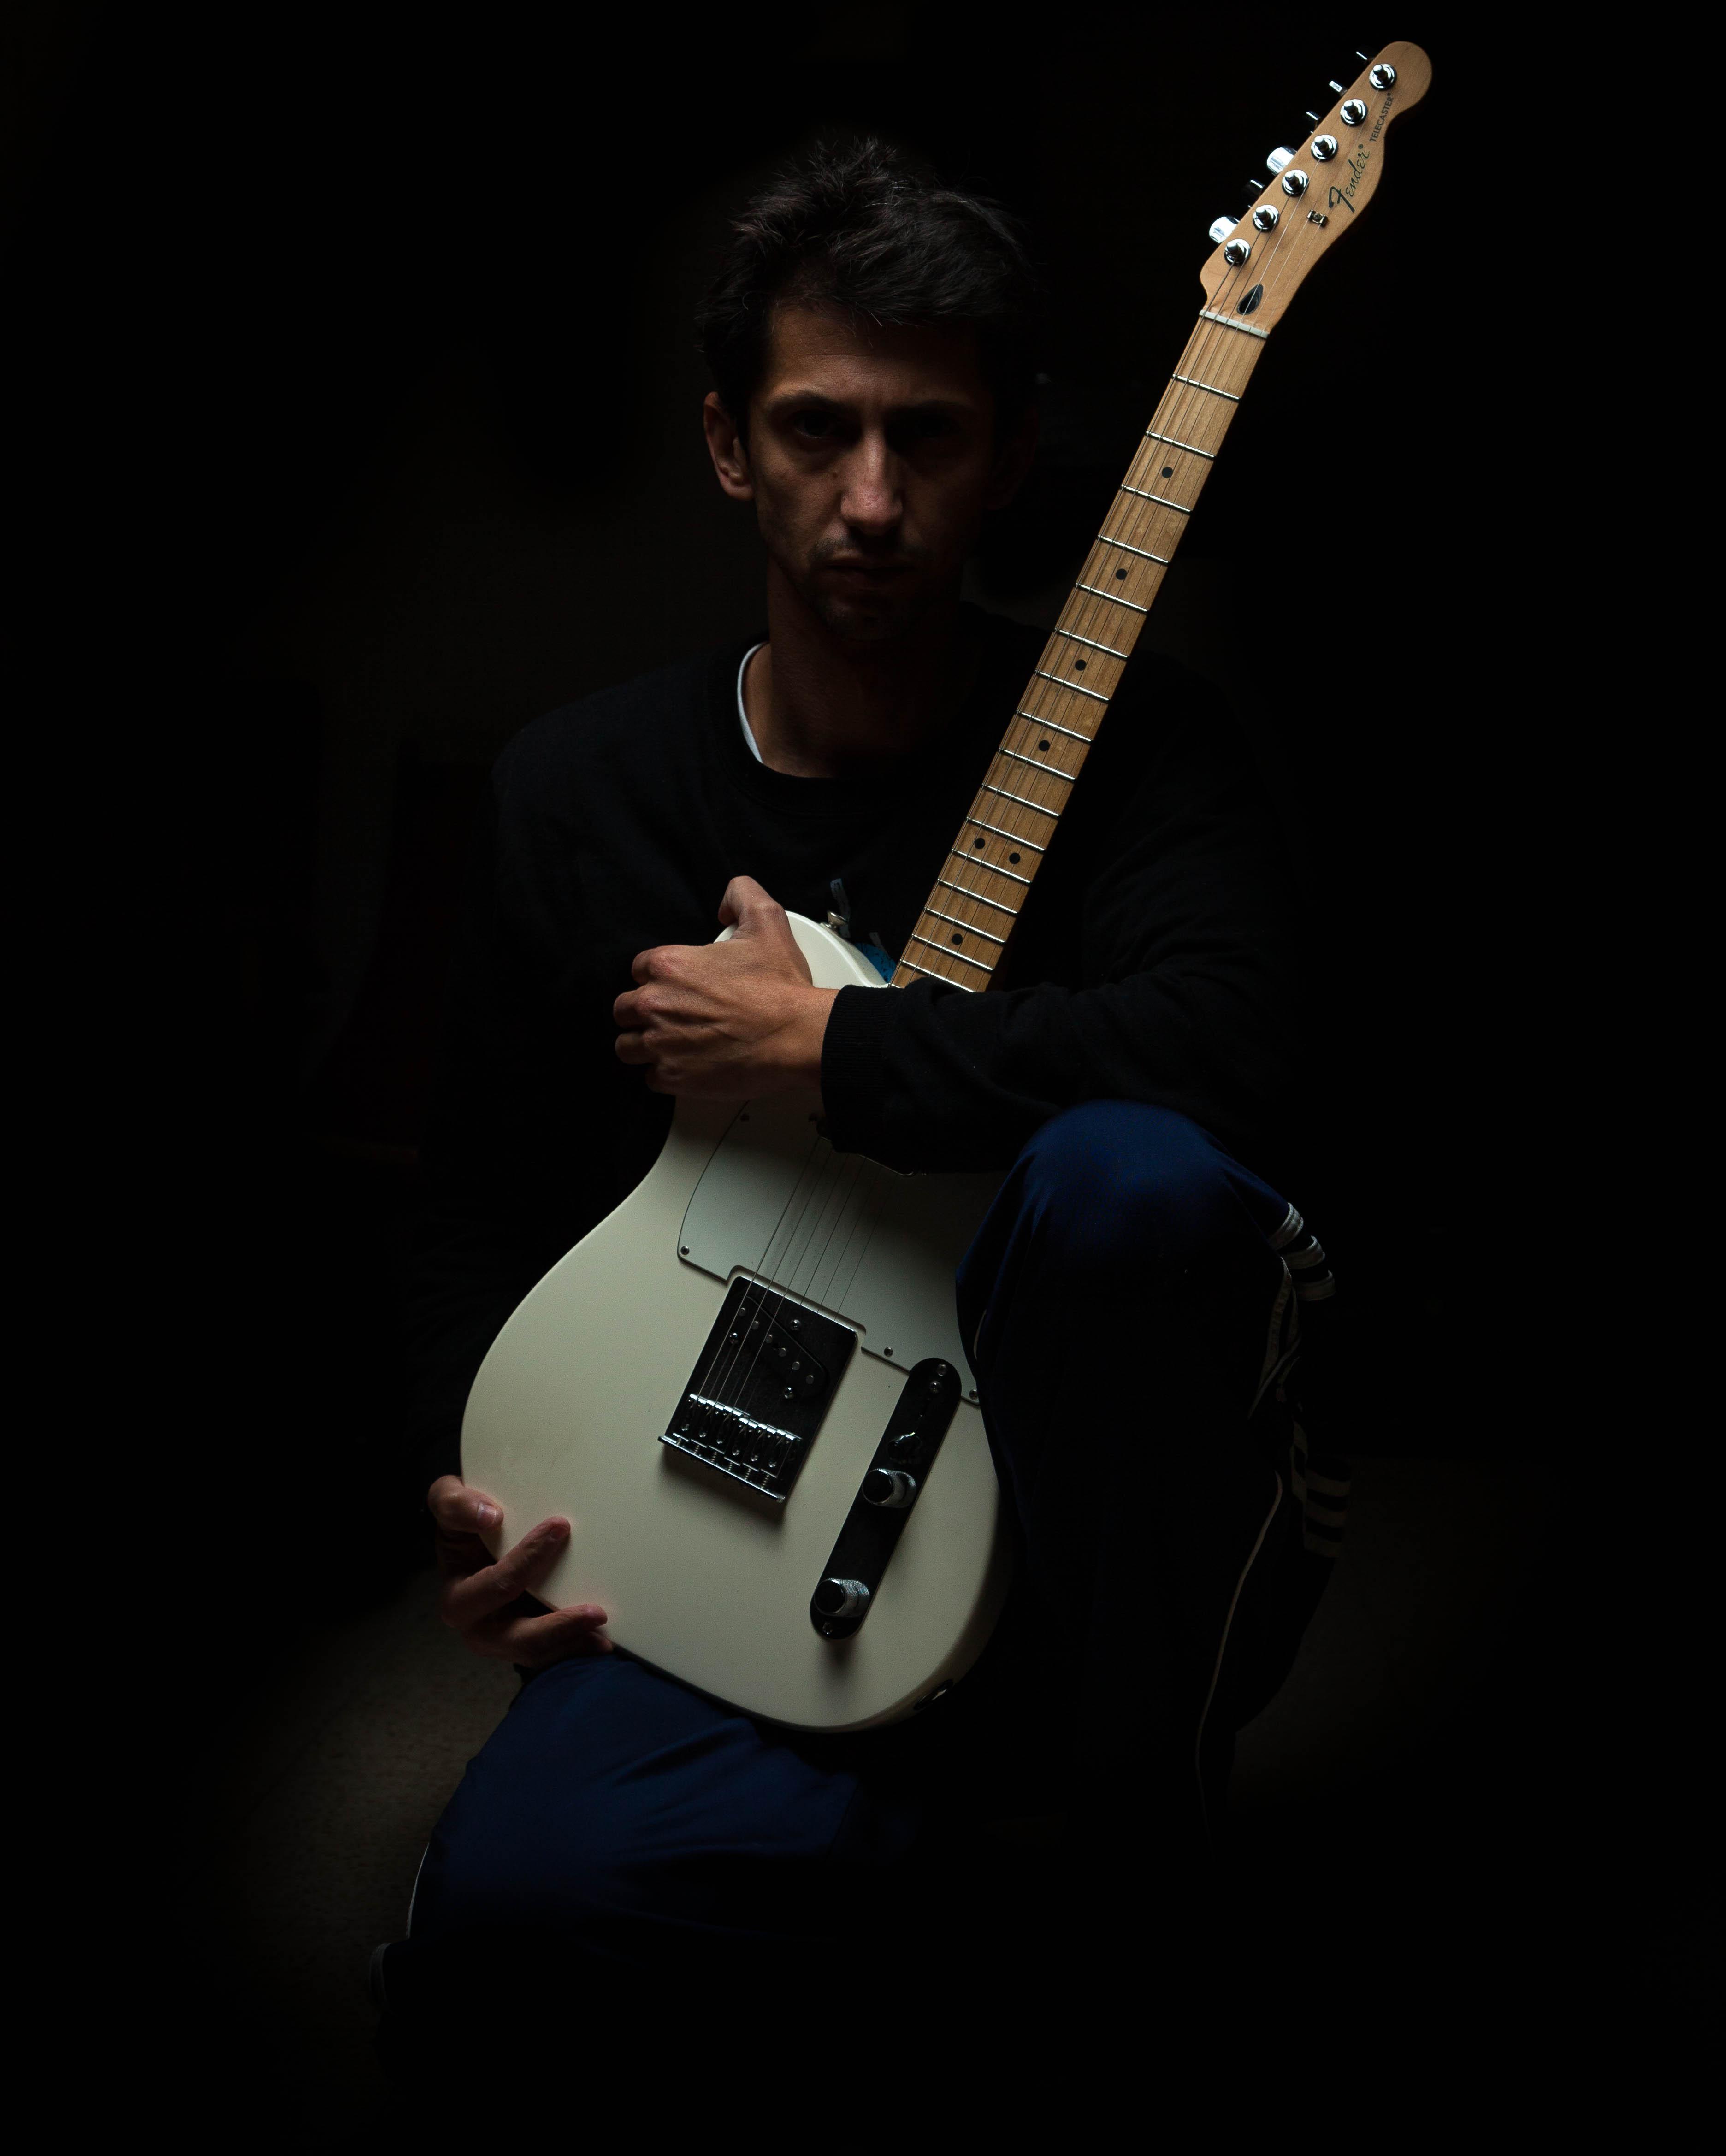 The guitar self portrait